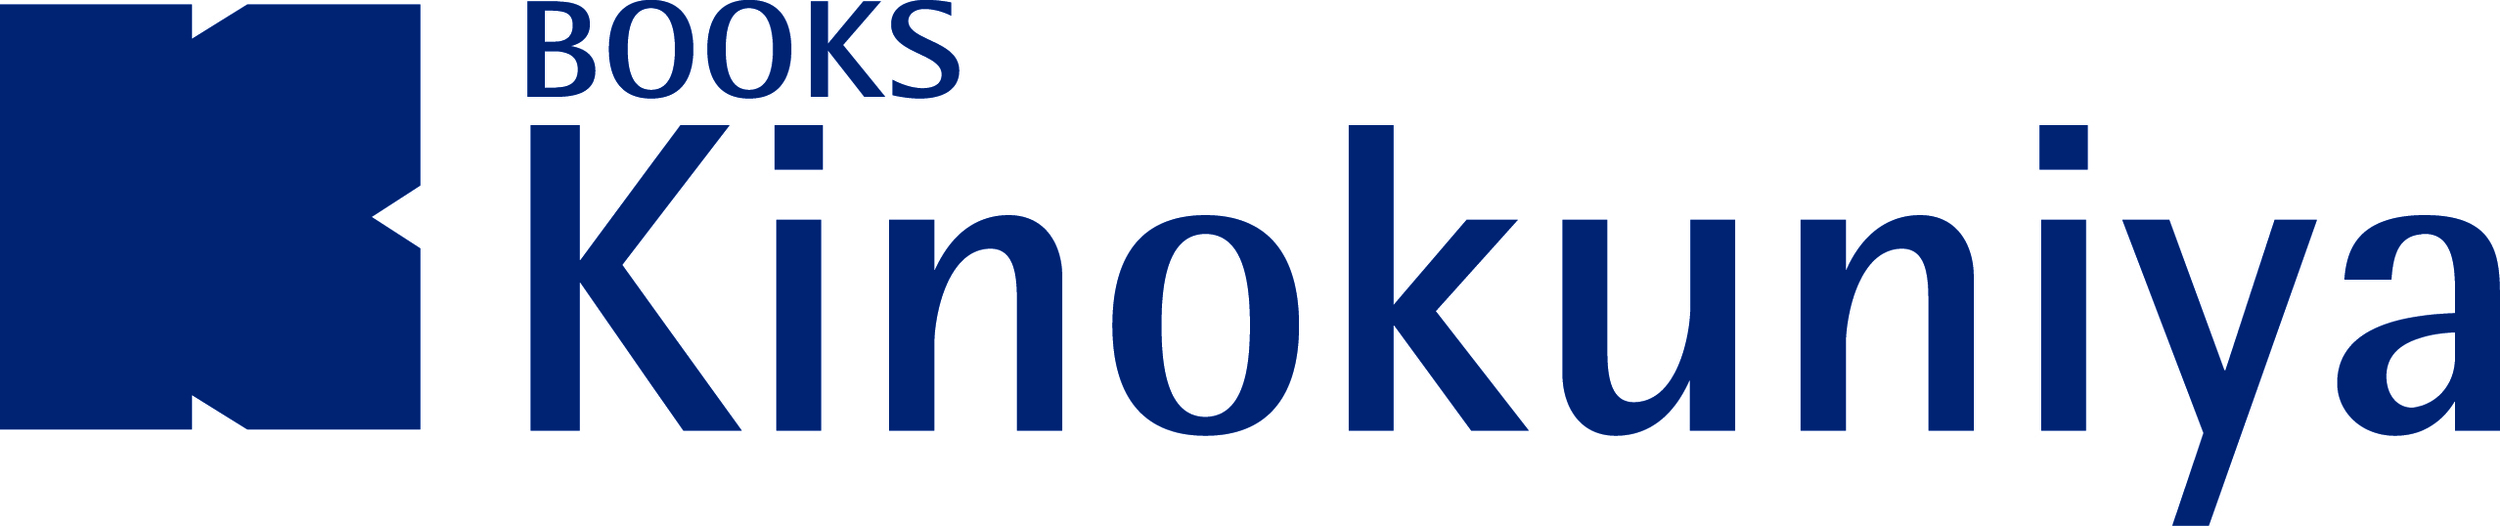 master_logo-kino.jpg